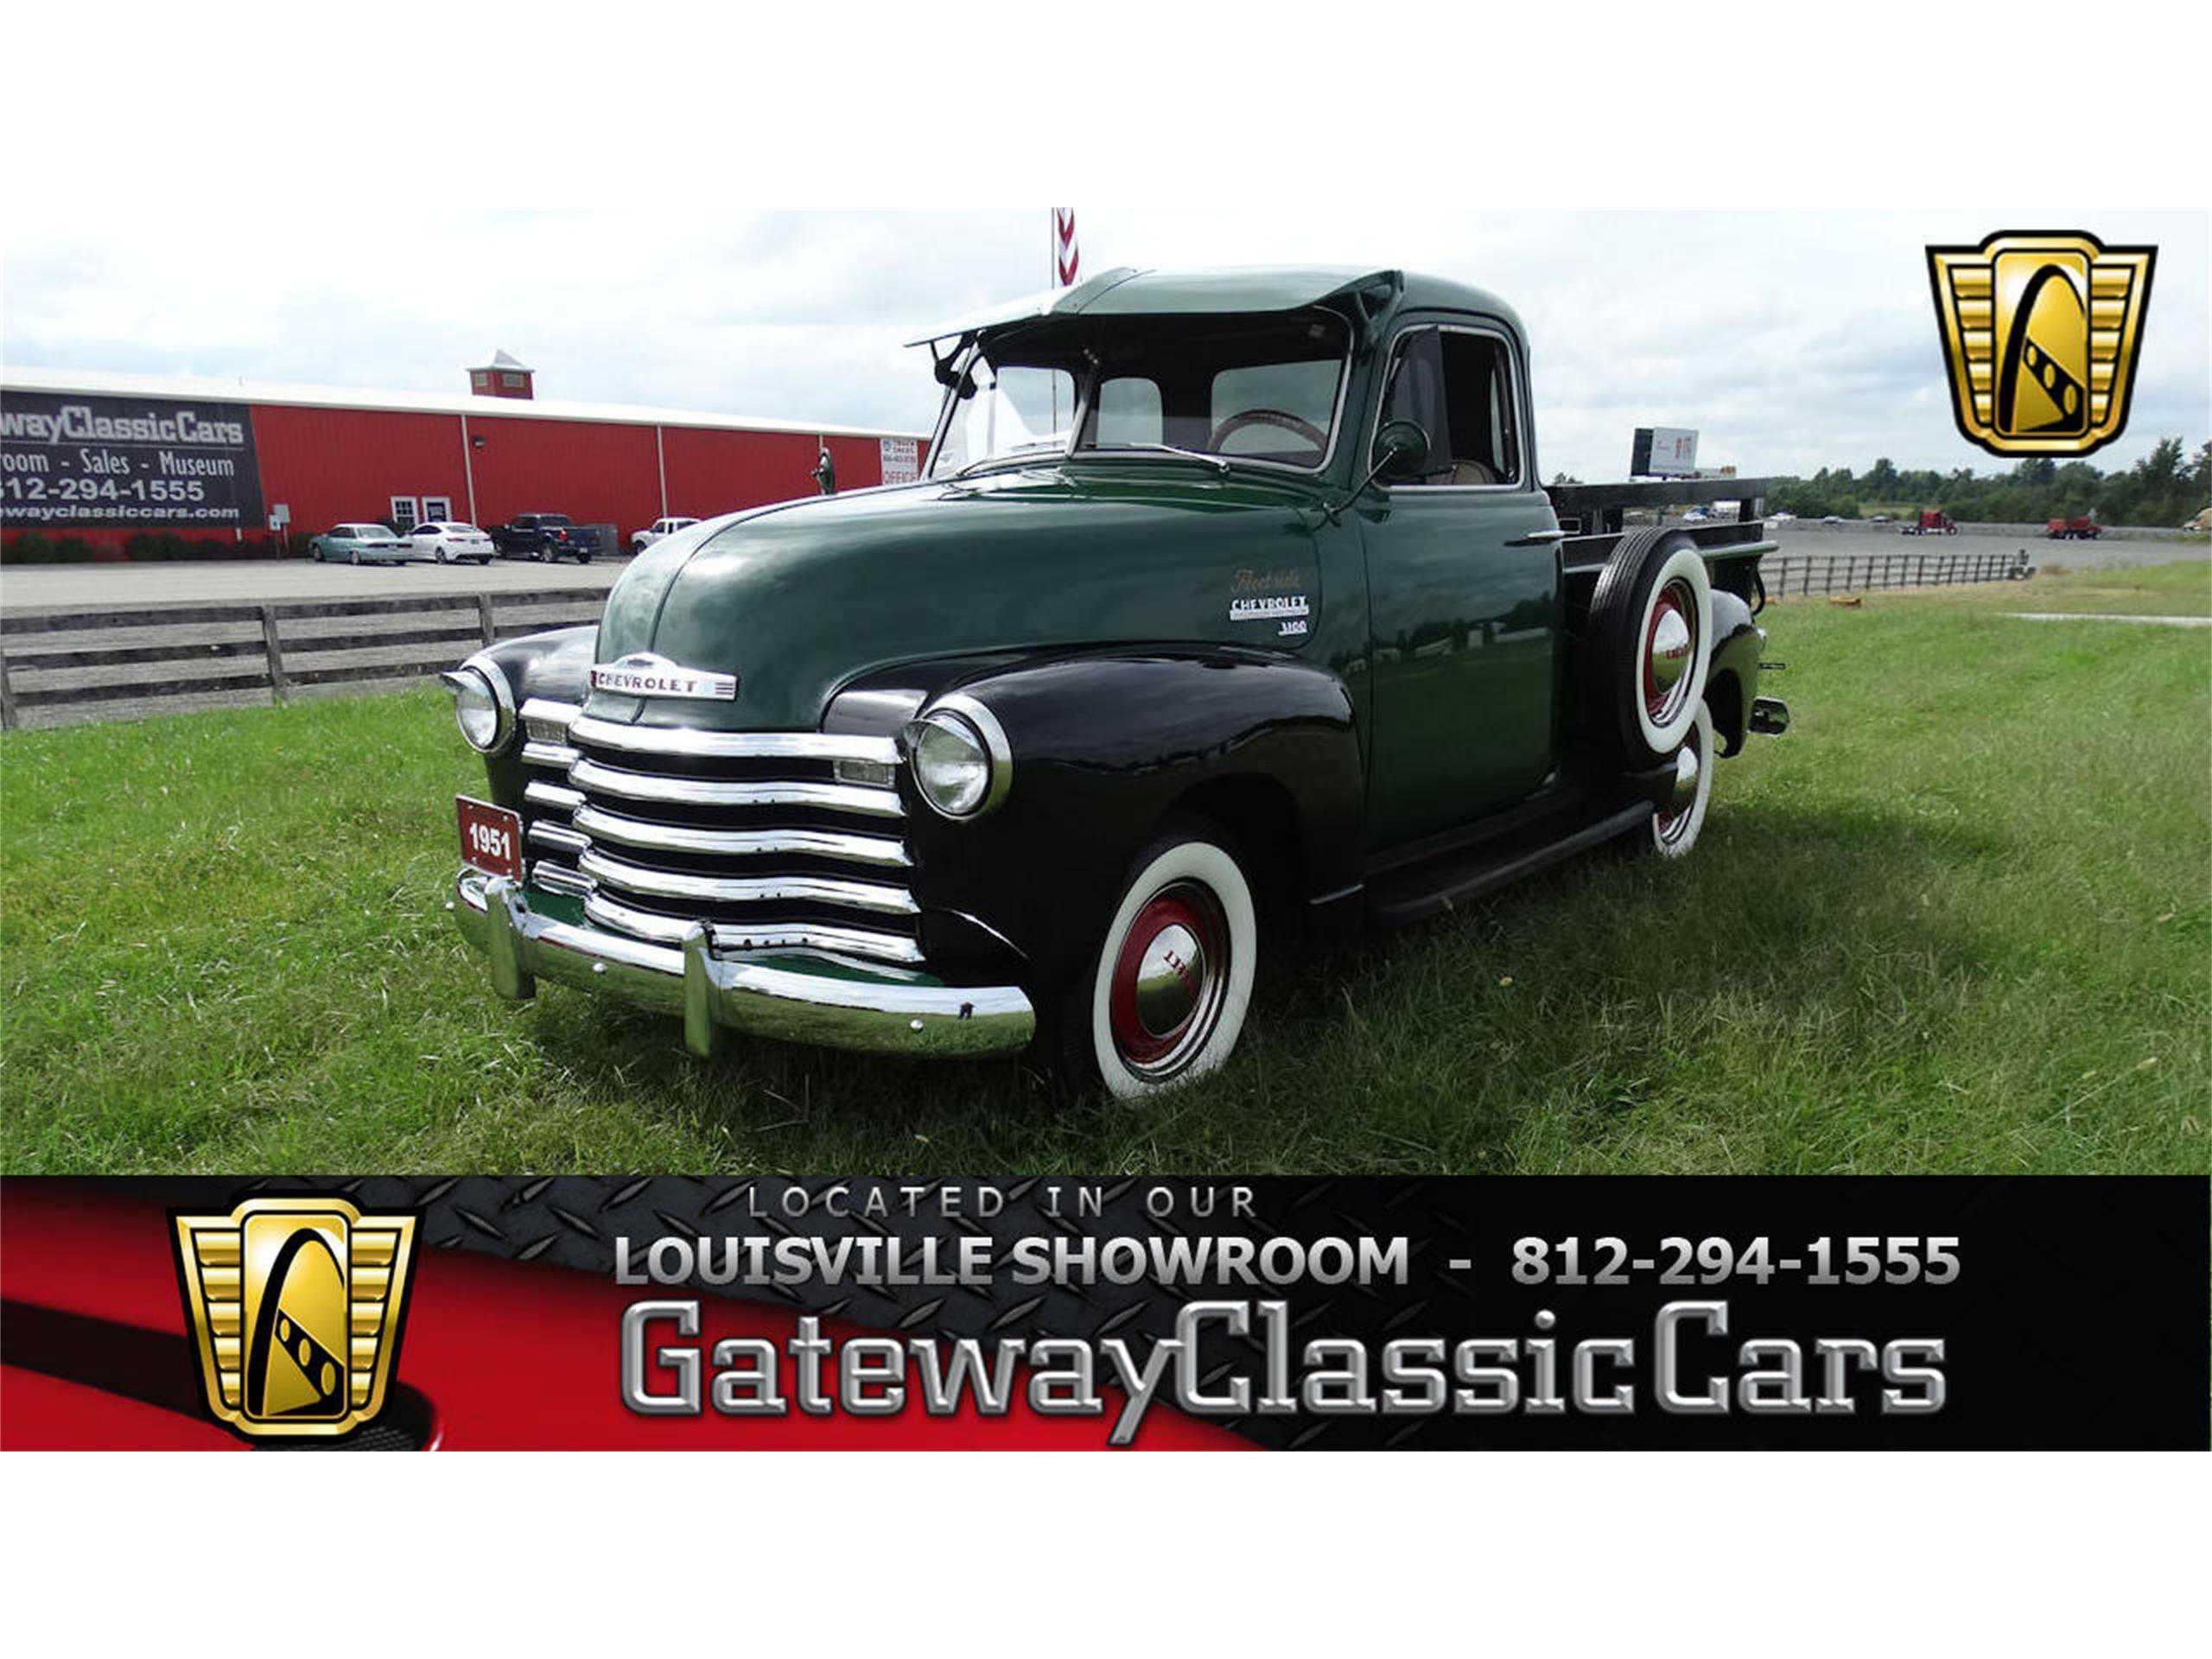 1951 Chevrolet 3100 For Sale In O Fallon Il Gcclou1956 2 Door Hardtop